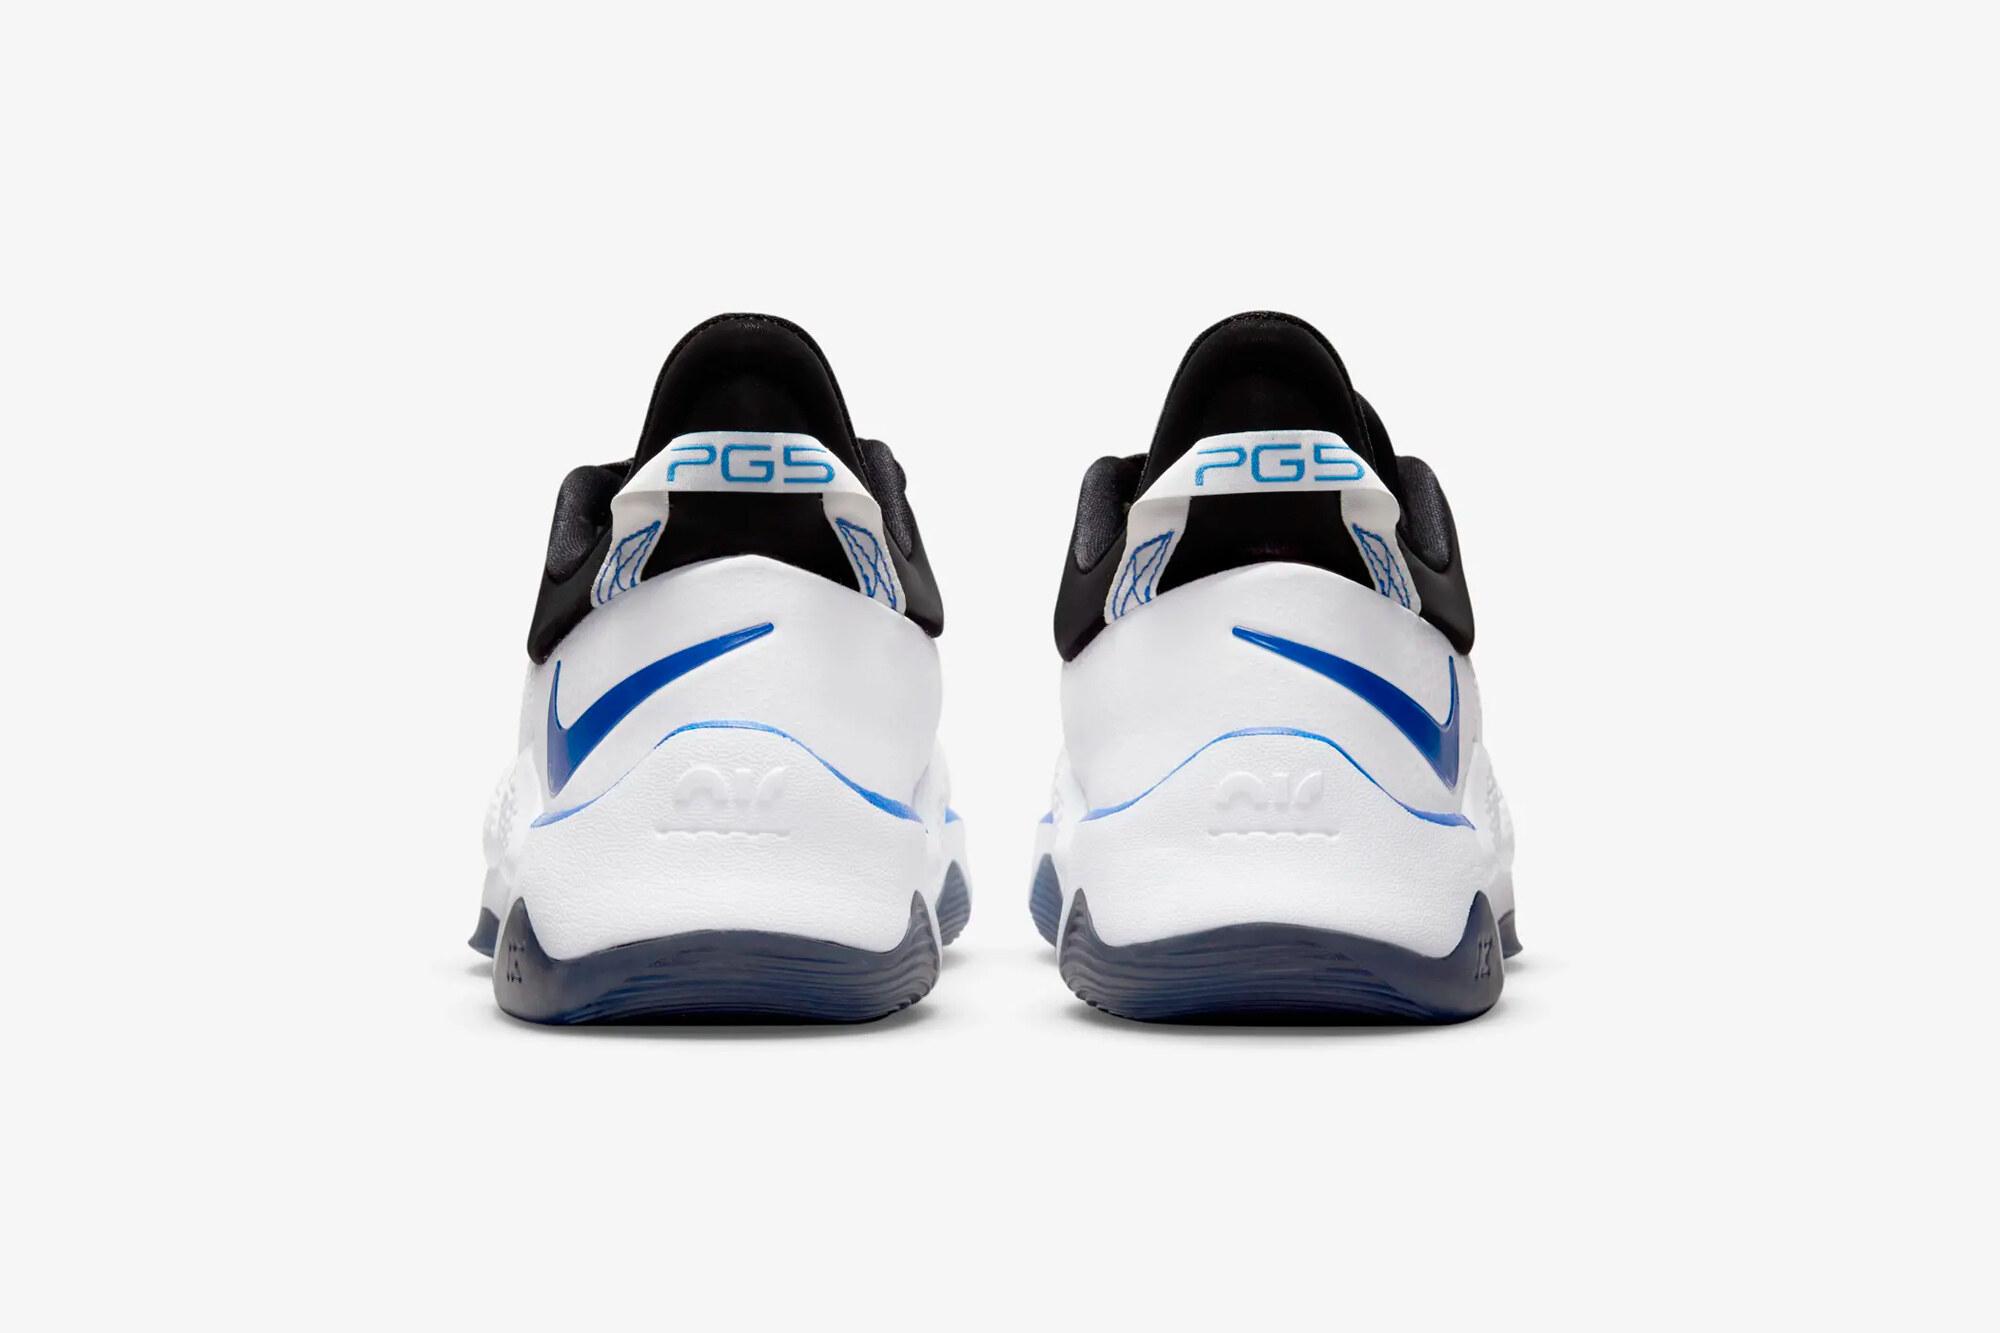 PlayStation 5 x Nike PG5